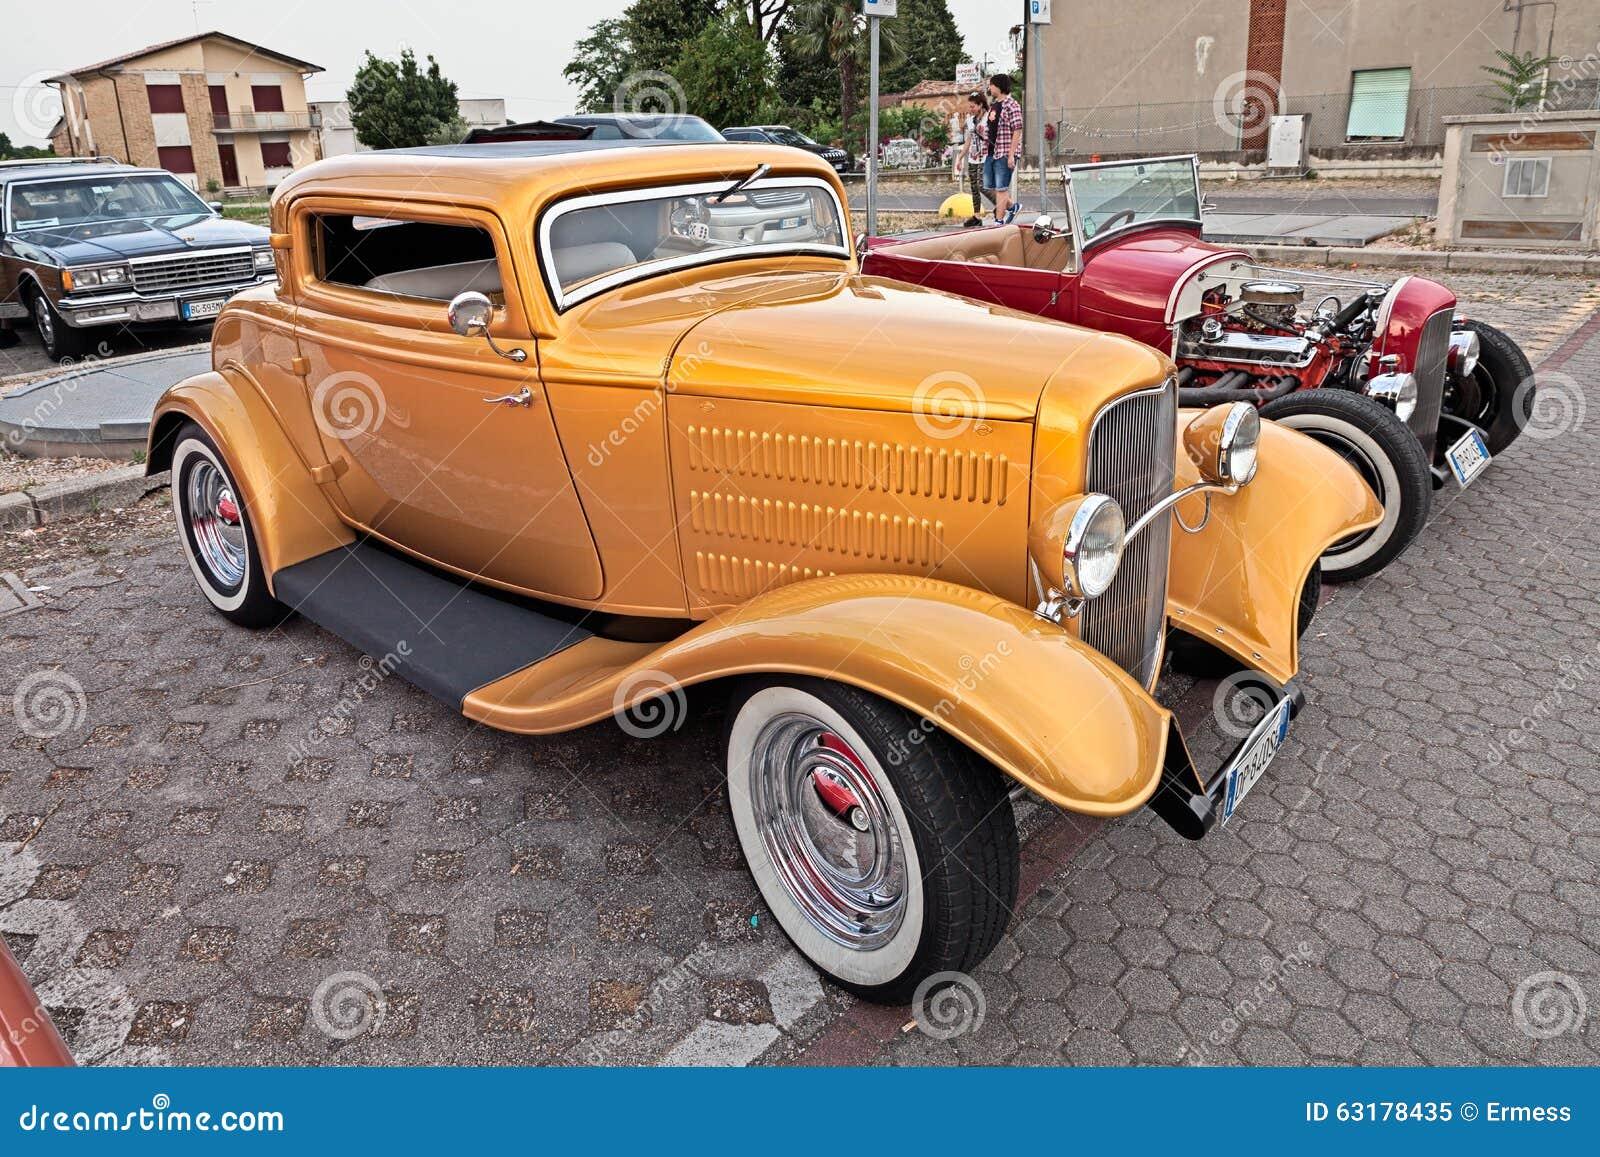 Vintage American Hot Rod Ford Editorial Image - Image of kustom ...